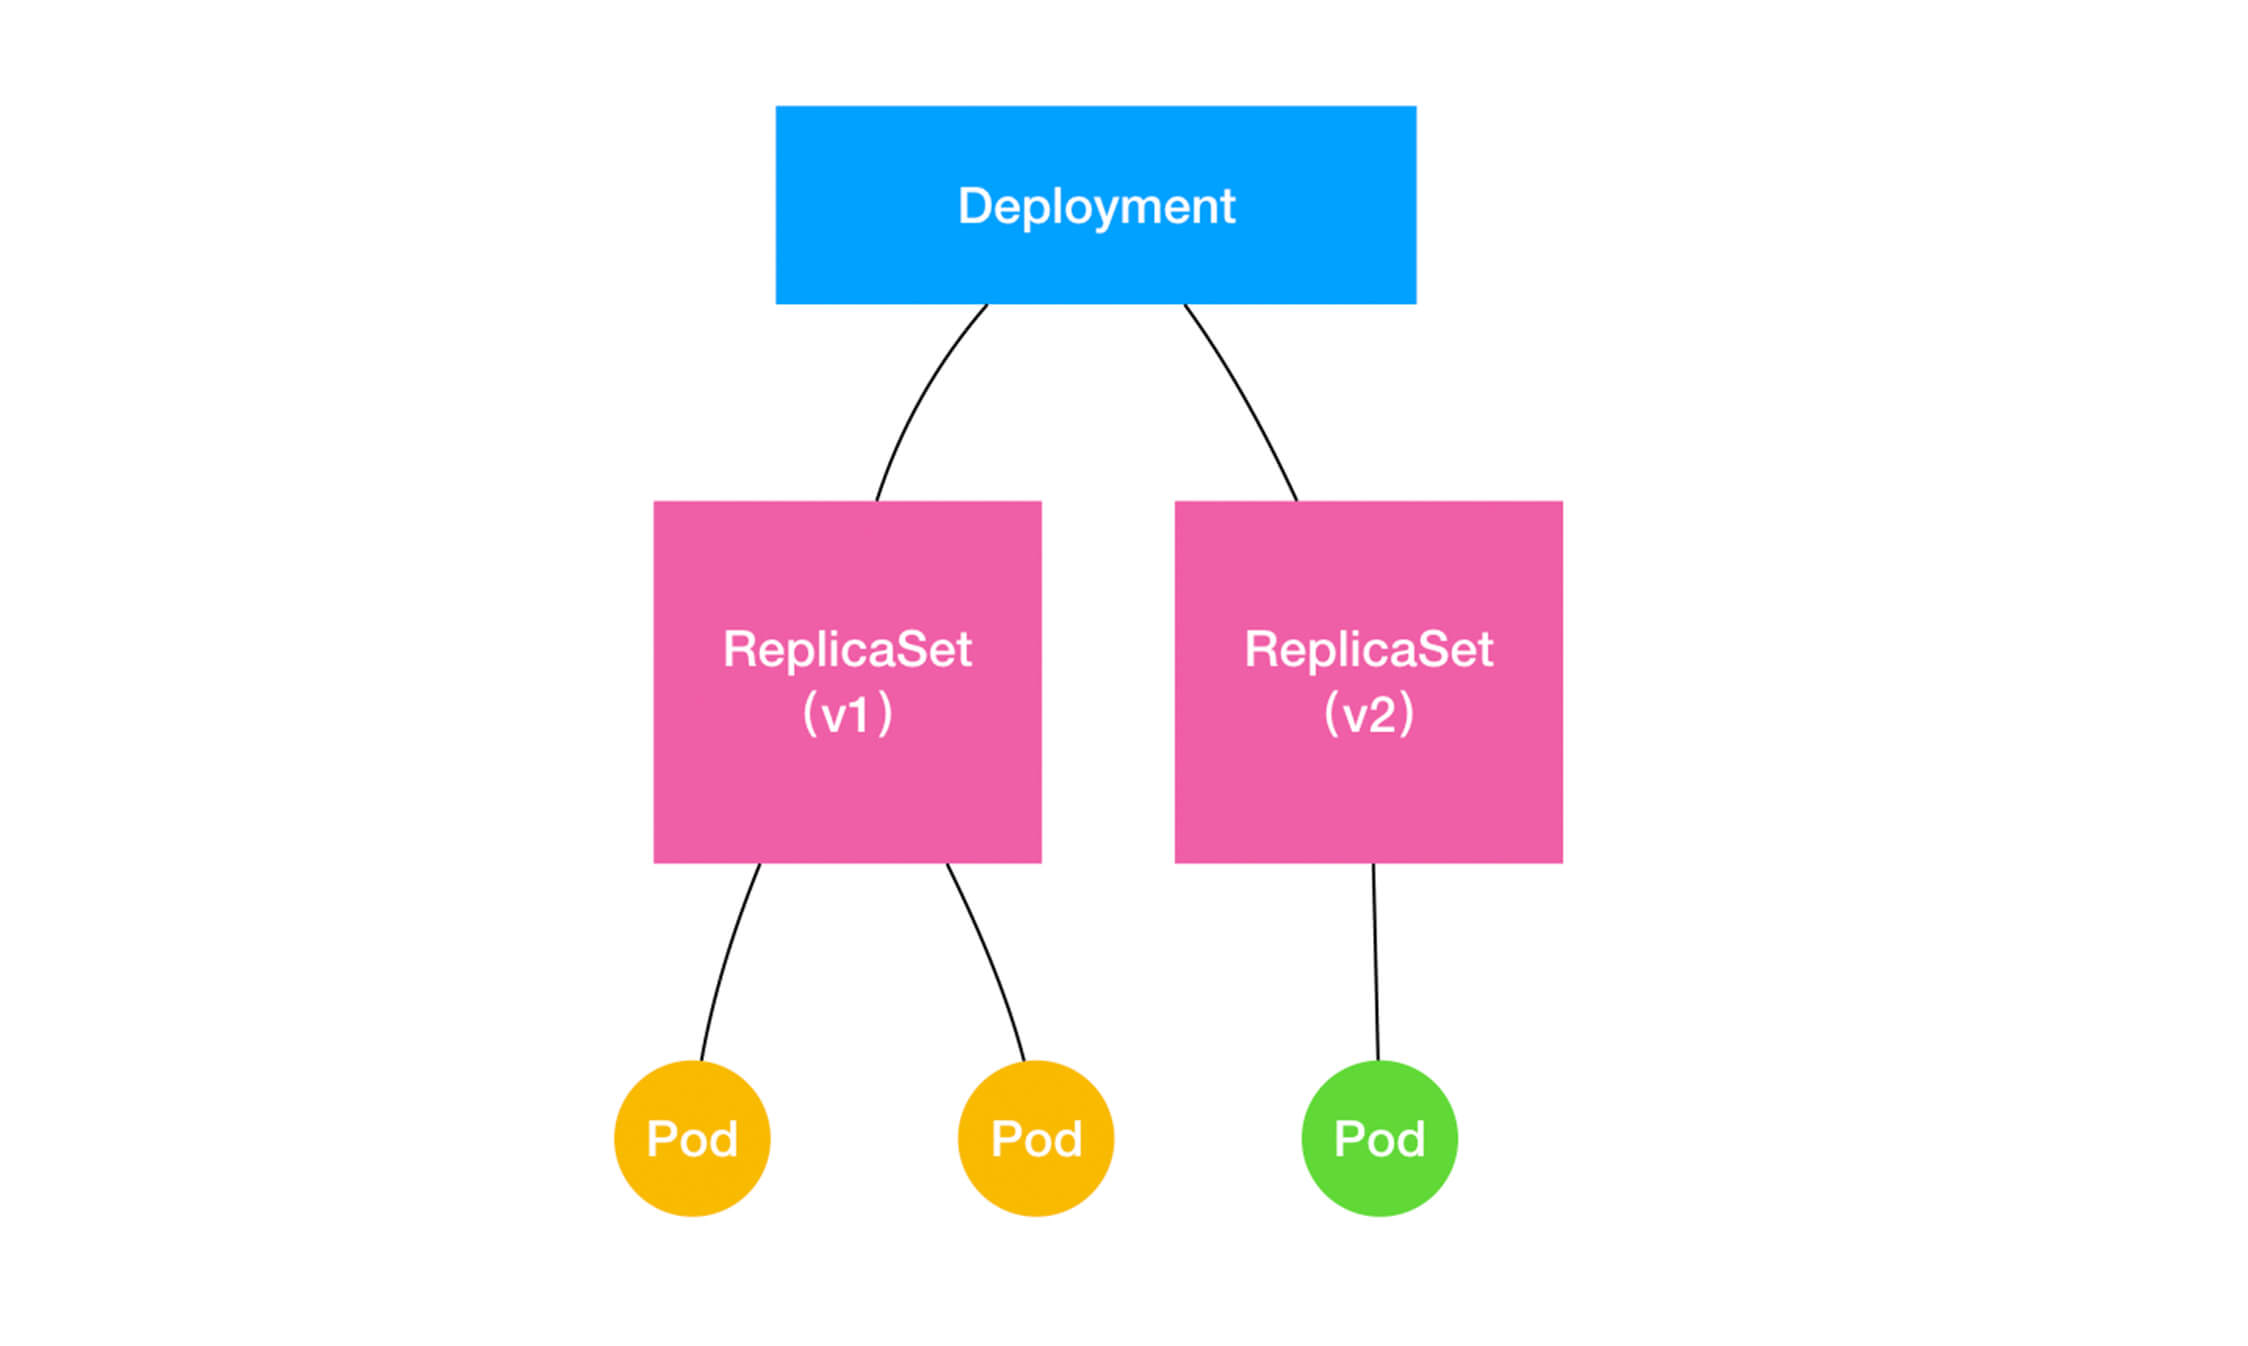 replicaset-roll-update